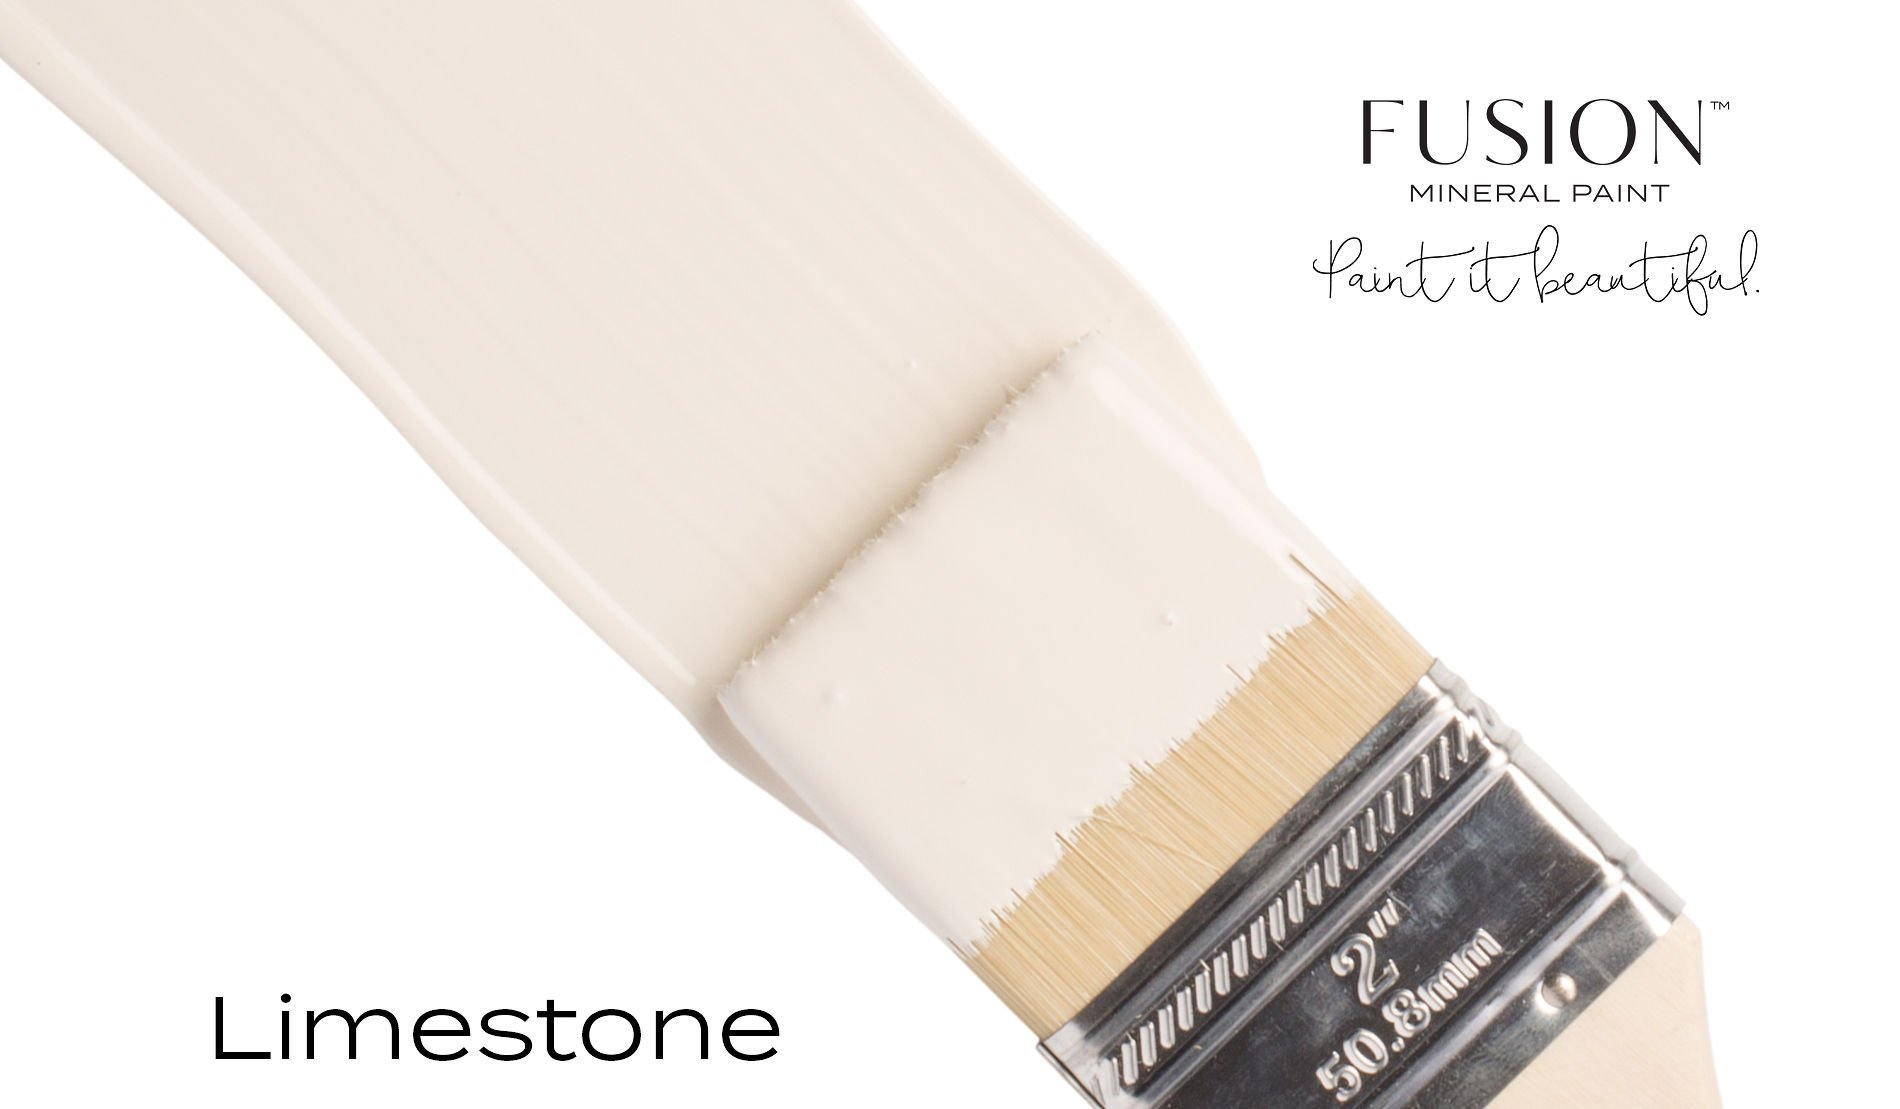 Fusion Mineral Paint Brushstroke - Limestone | www.raggedy-bits.com